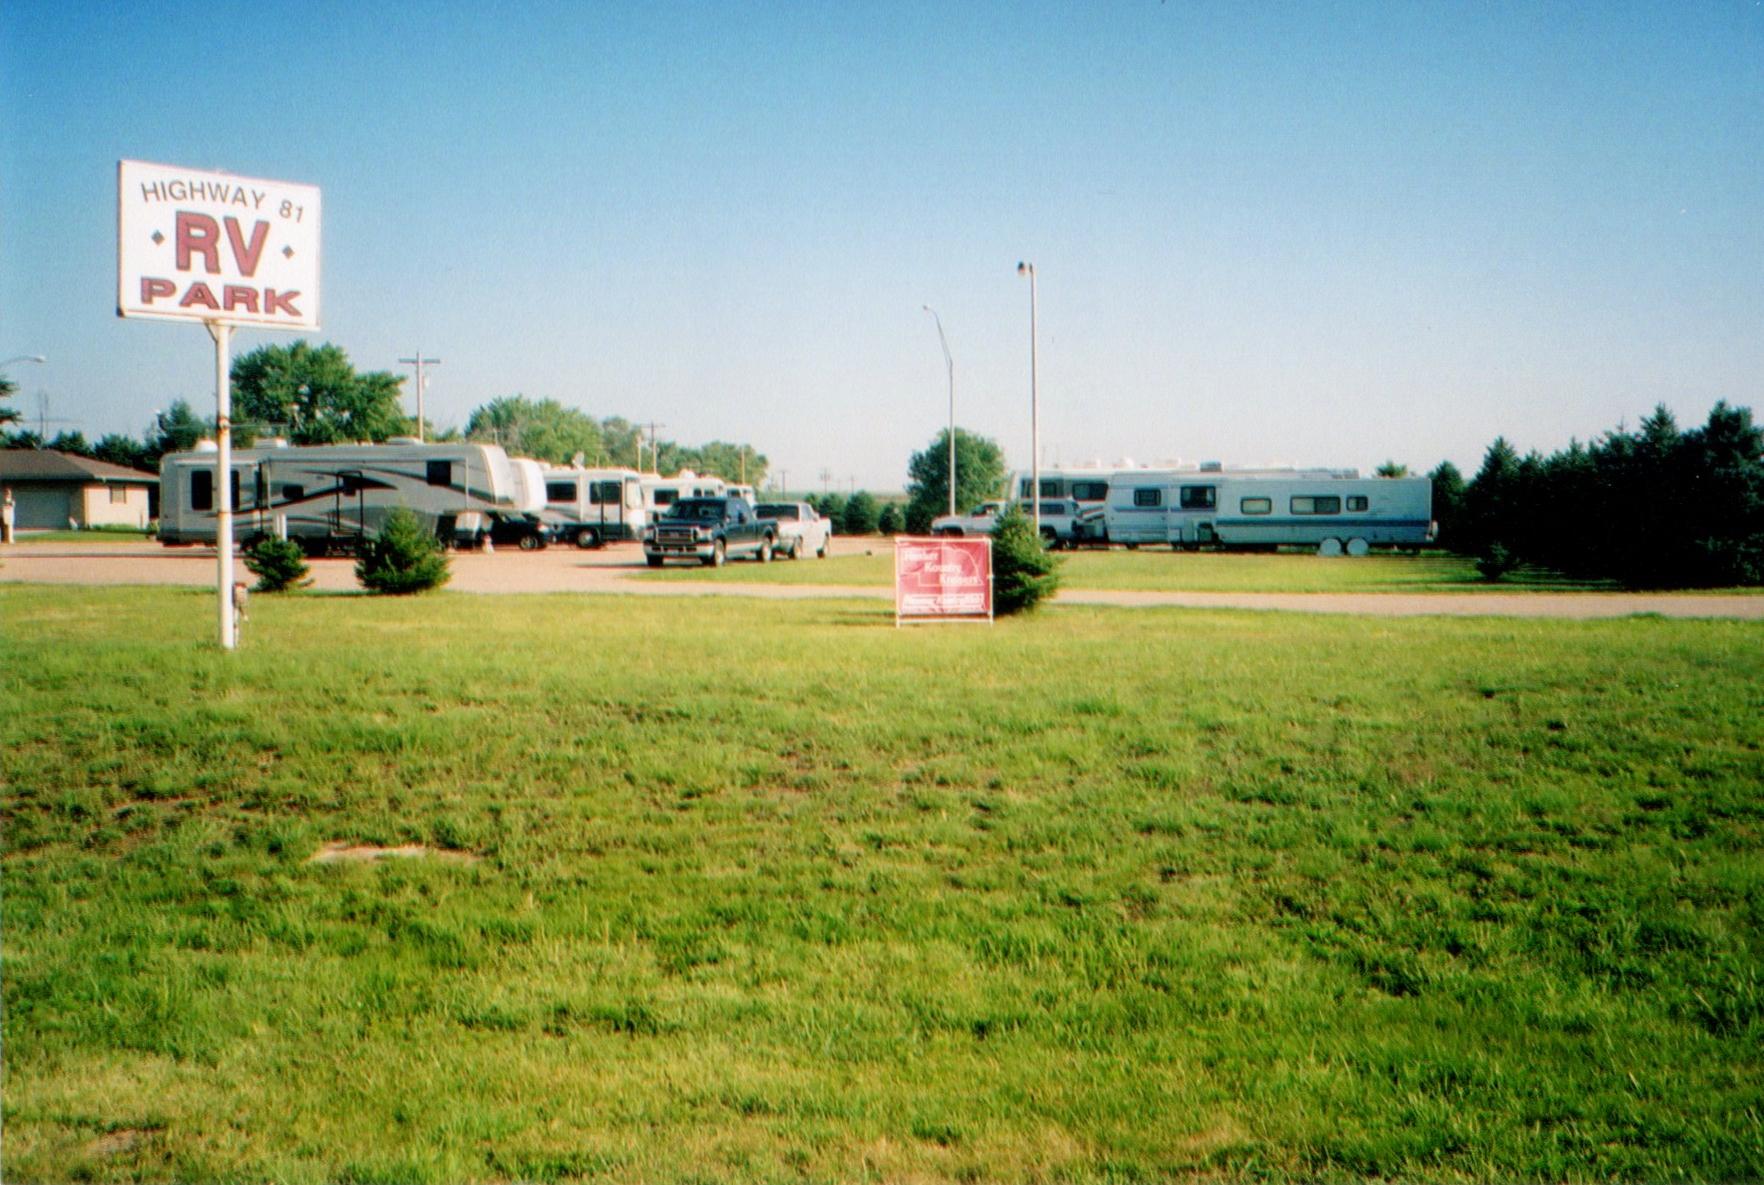 Location, 23817 242nd Ave, Columbus, Nebraska, 68601, United States